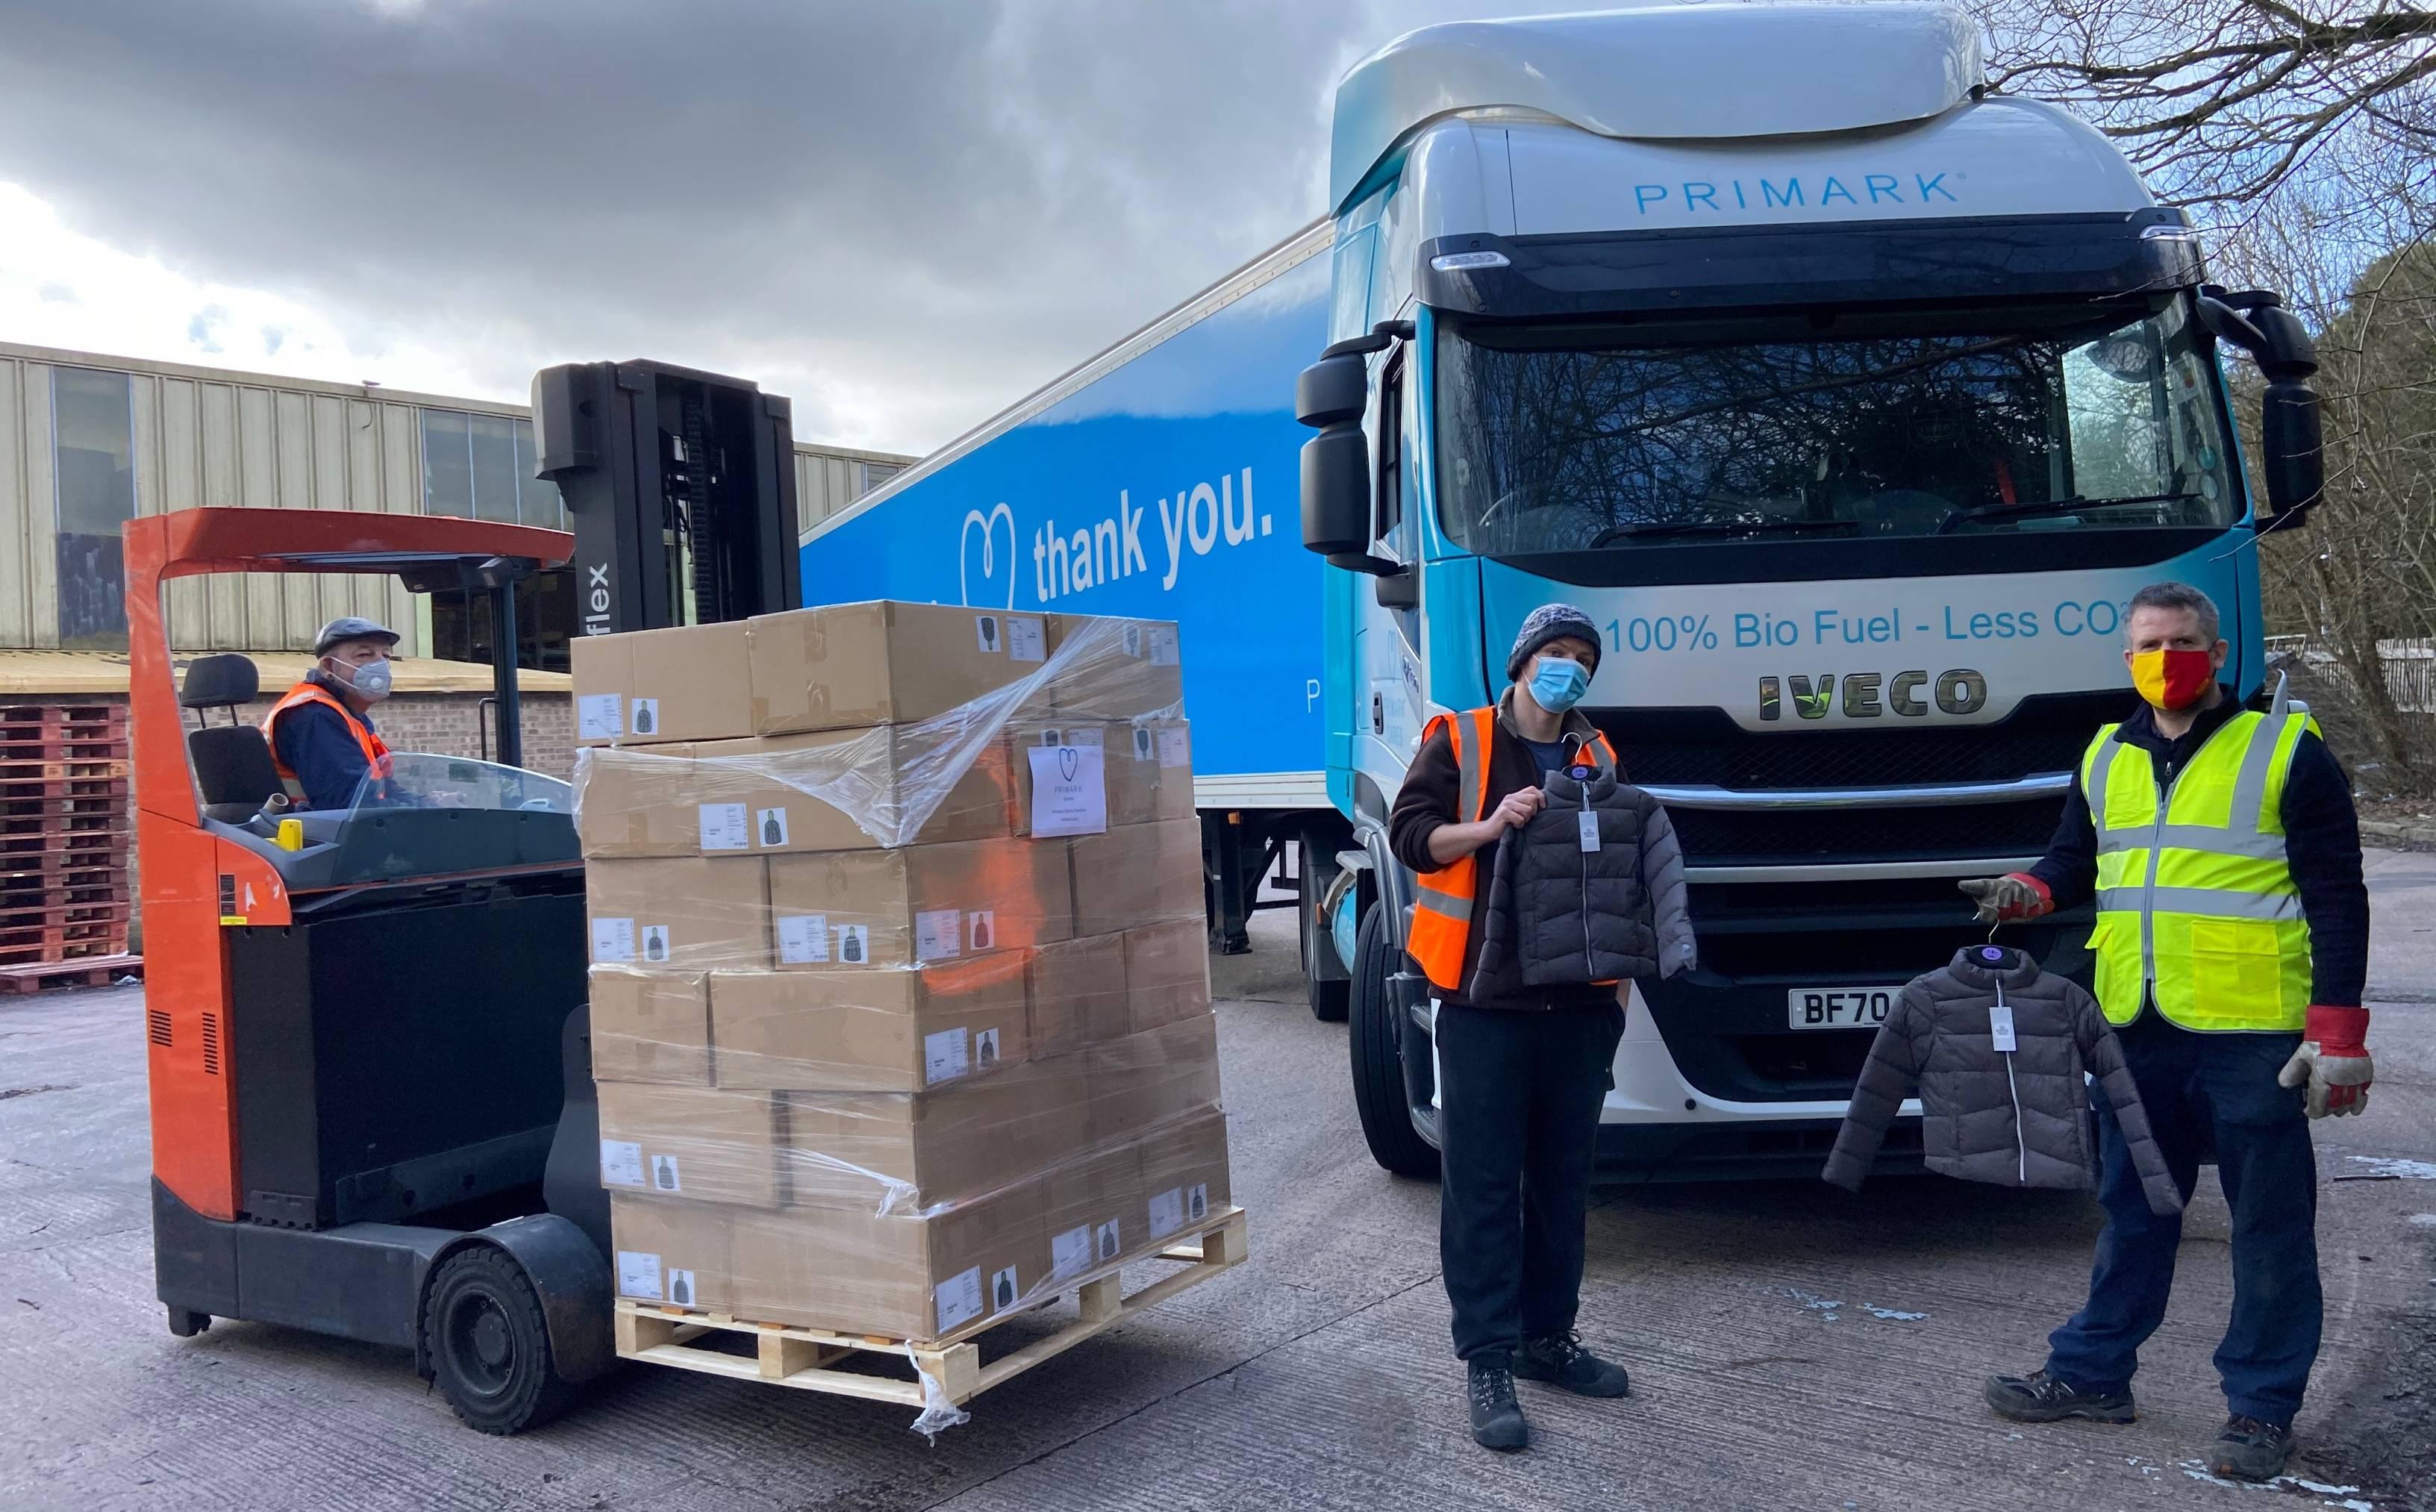 Primark donates over 20,000 coats to children in need